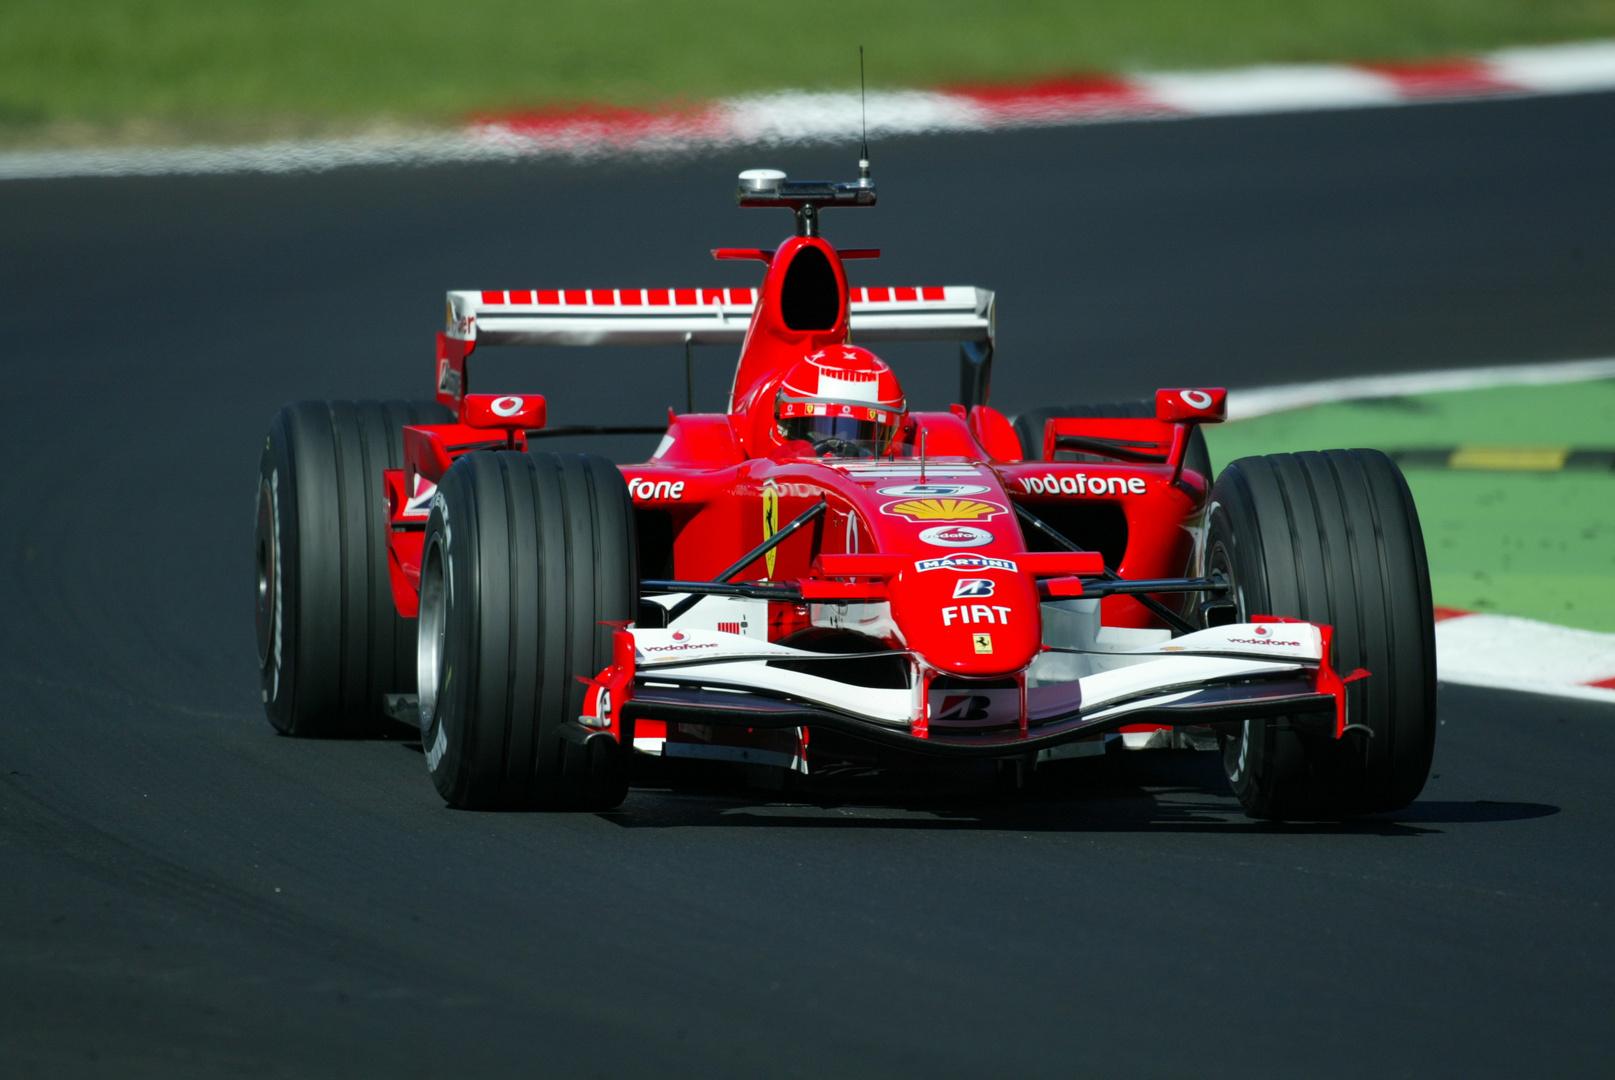 Michael Schumacher in Monza 2006